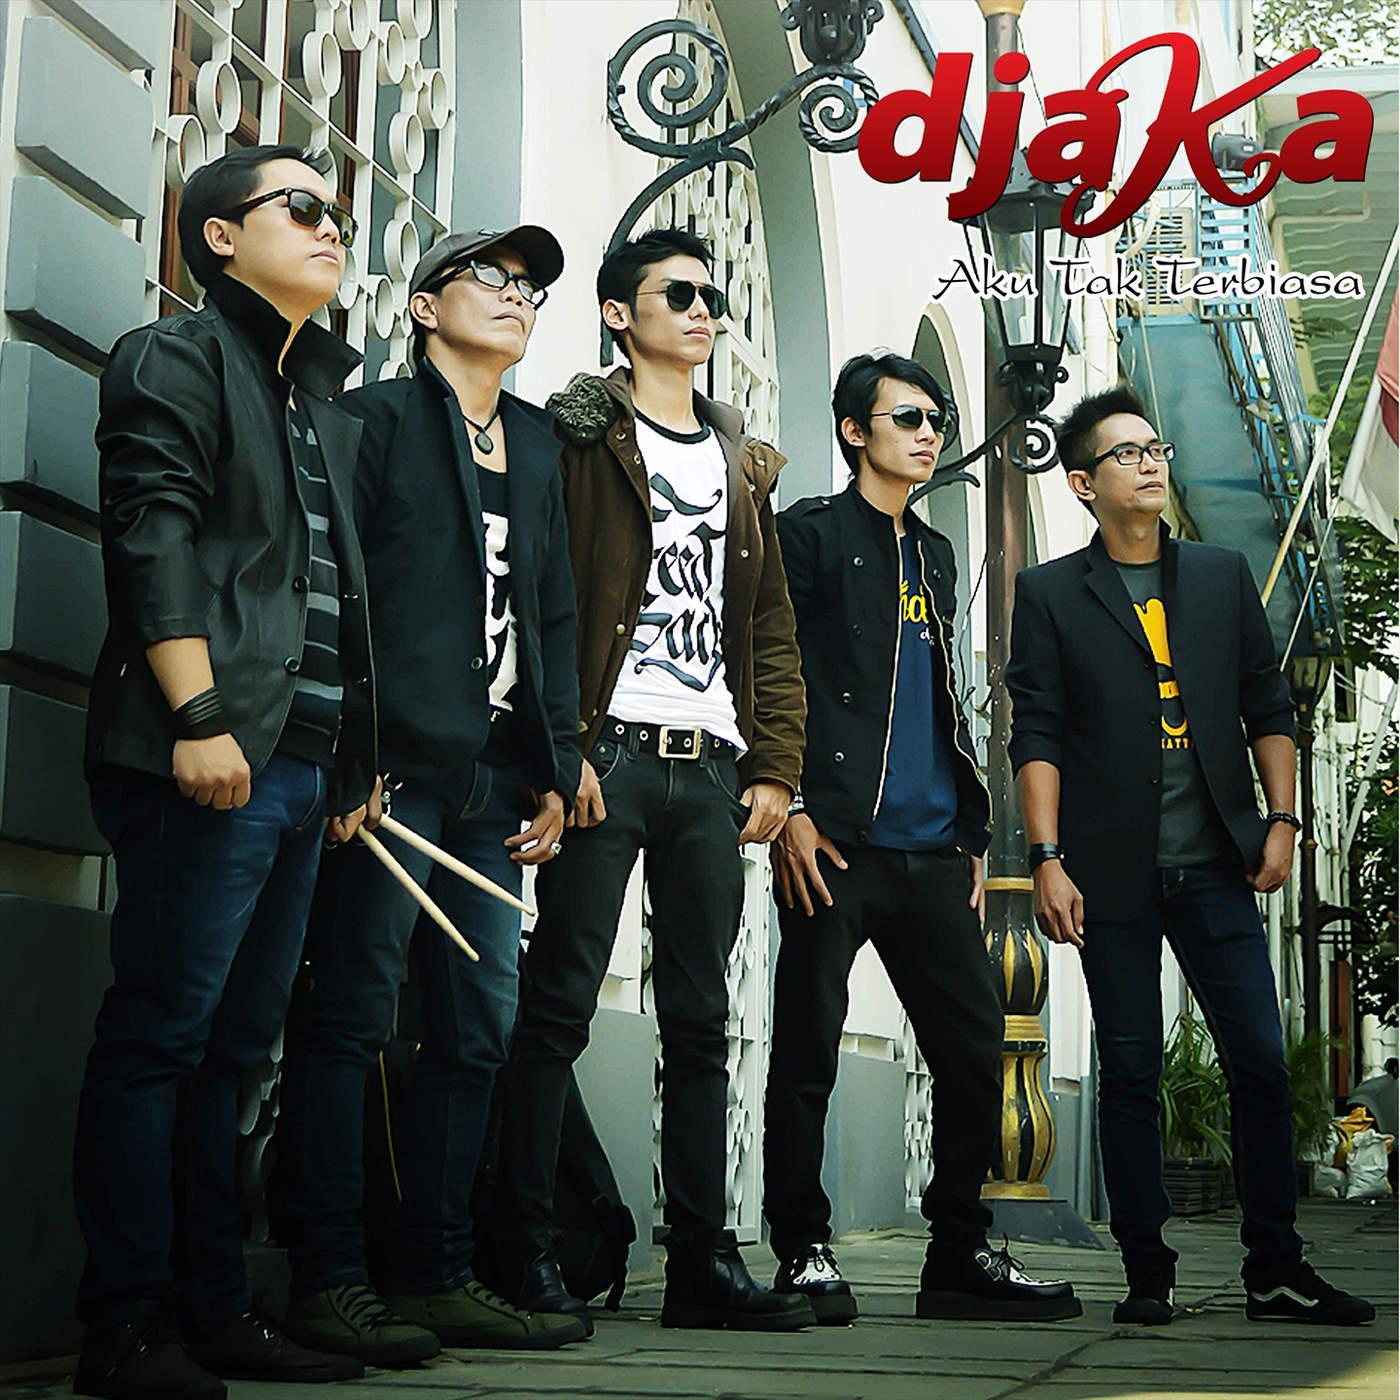 Download Lagu Karna Su Sayang Wapka: Single (2014) [iTunes Plus AAC